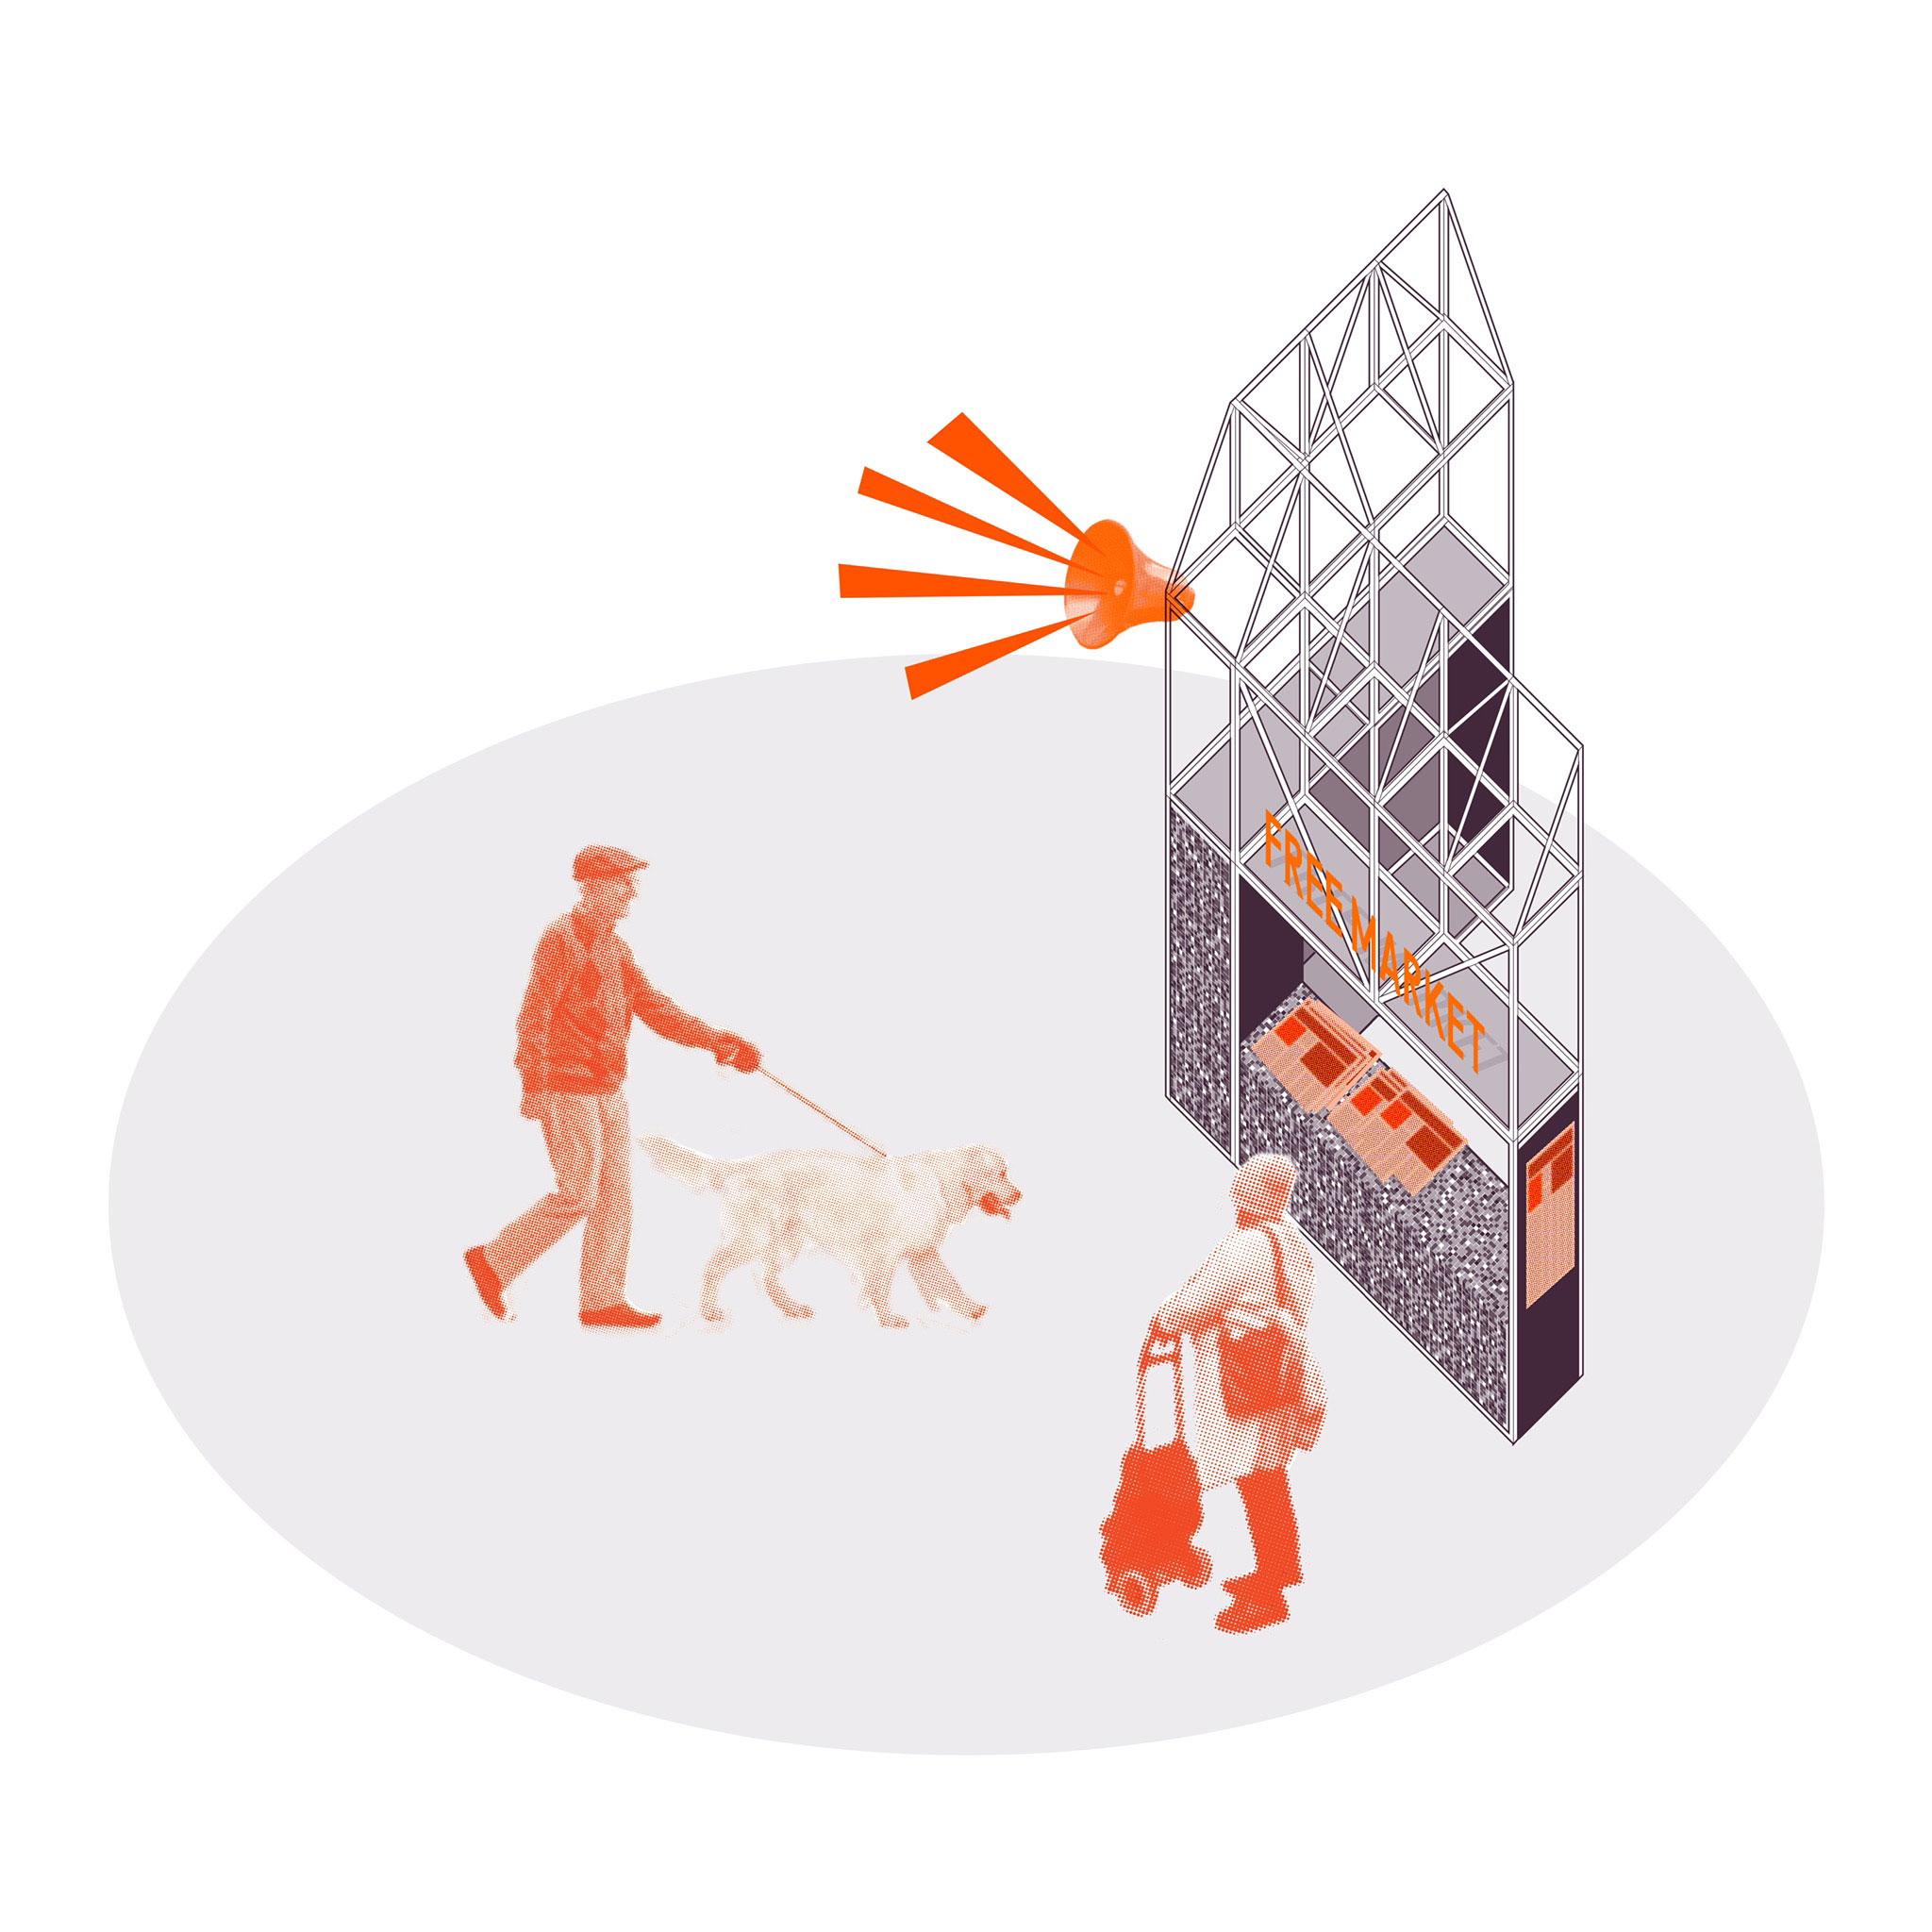 Free market diagram. Irish Pavilion's Free Market at the Biennale Architettura 2018. Image by Mark Wickham